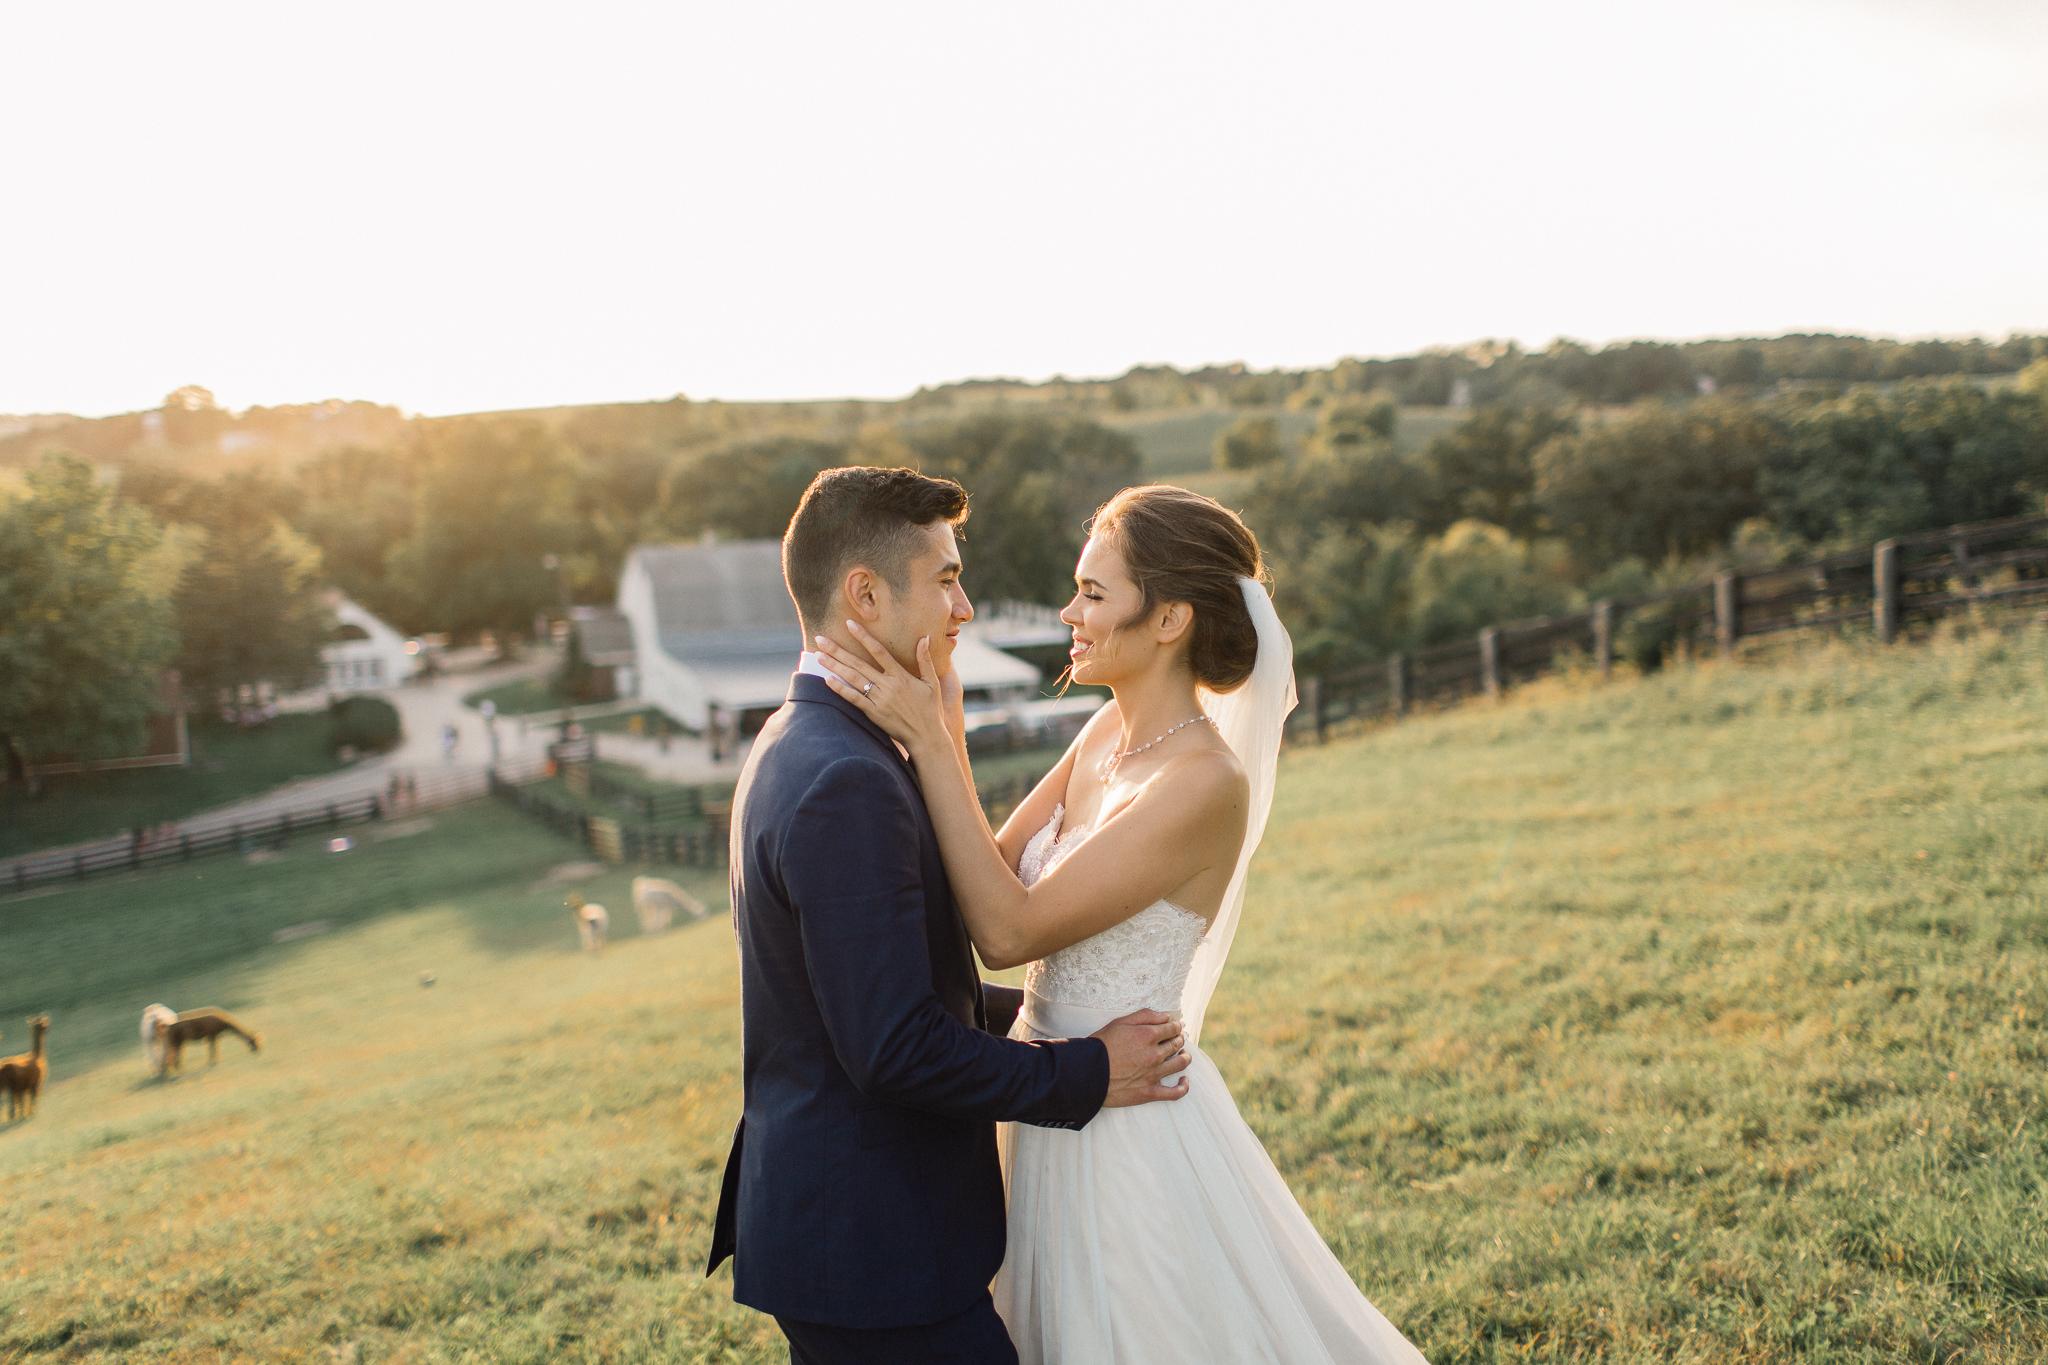 20180909_AnastasiaChandler_wedding_692.jpg